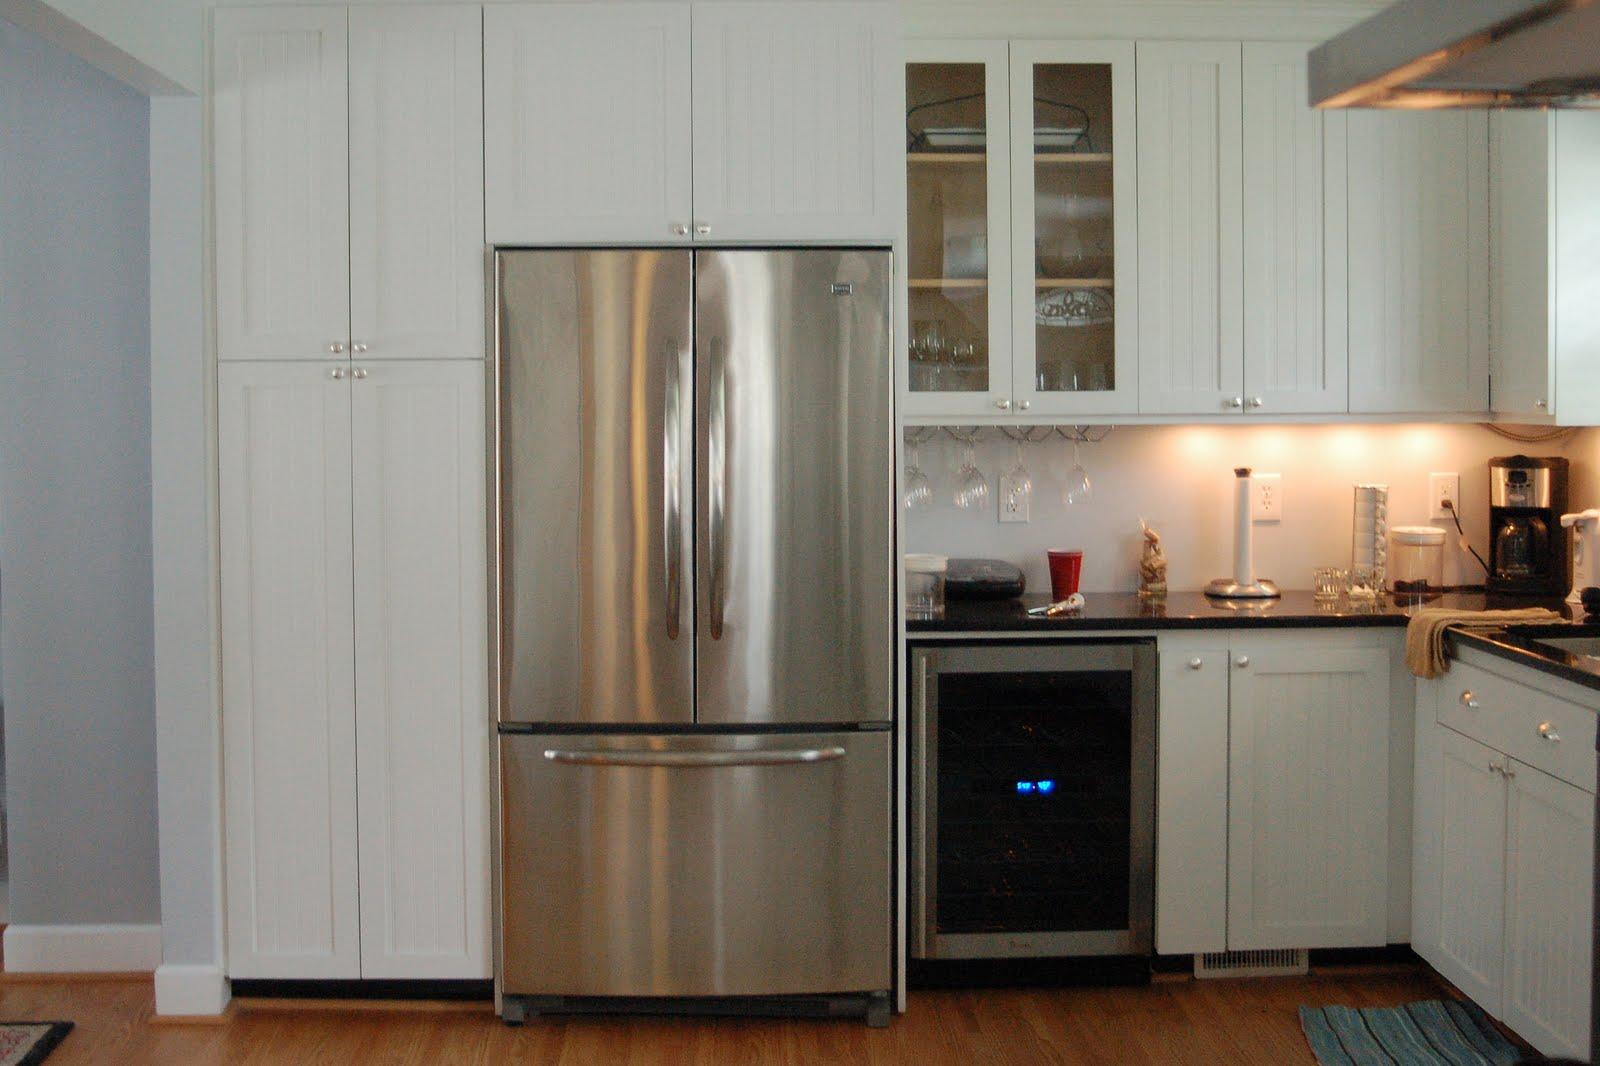 Kitchenaid French Door Refrigerator Persian Proverbs: April 2011